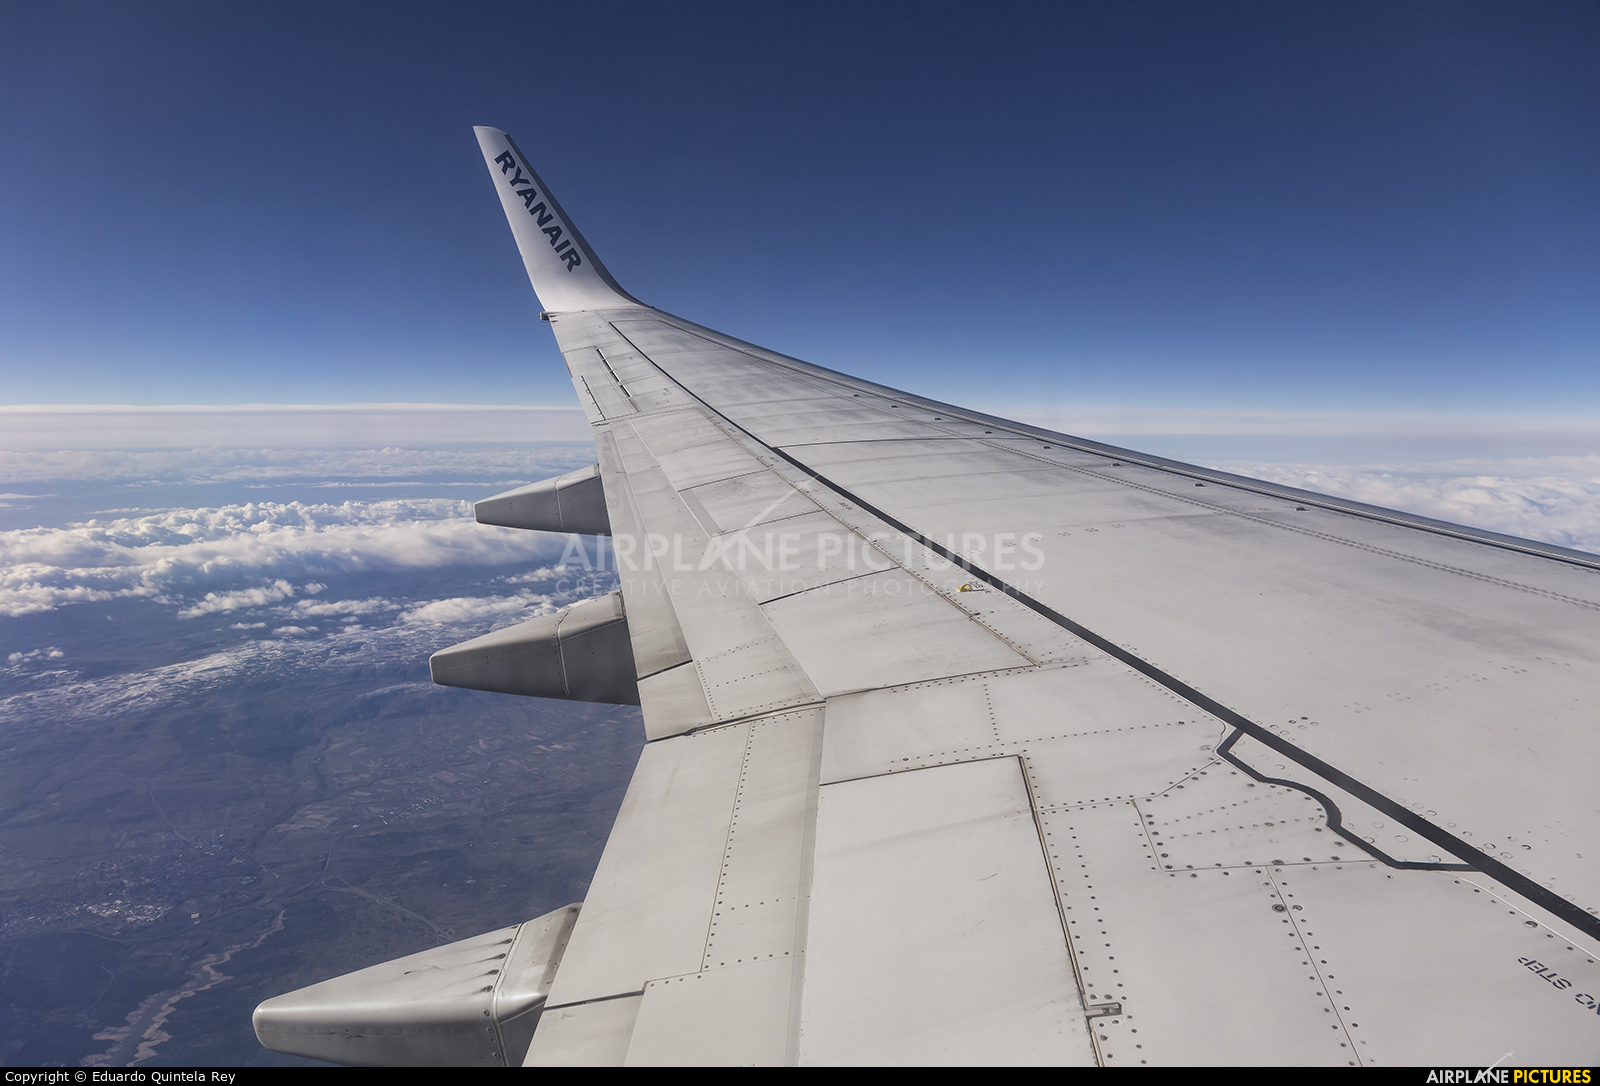 Ryanair EI-DWC aircraft at In Flight - Spain